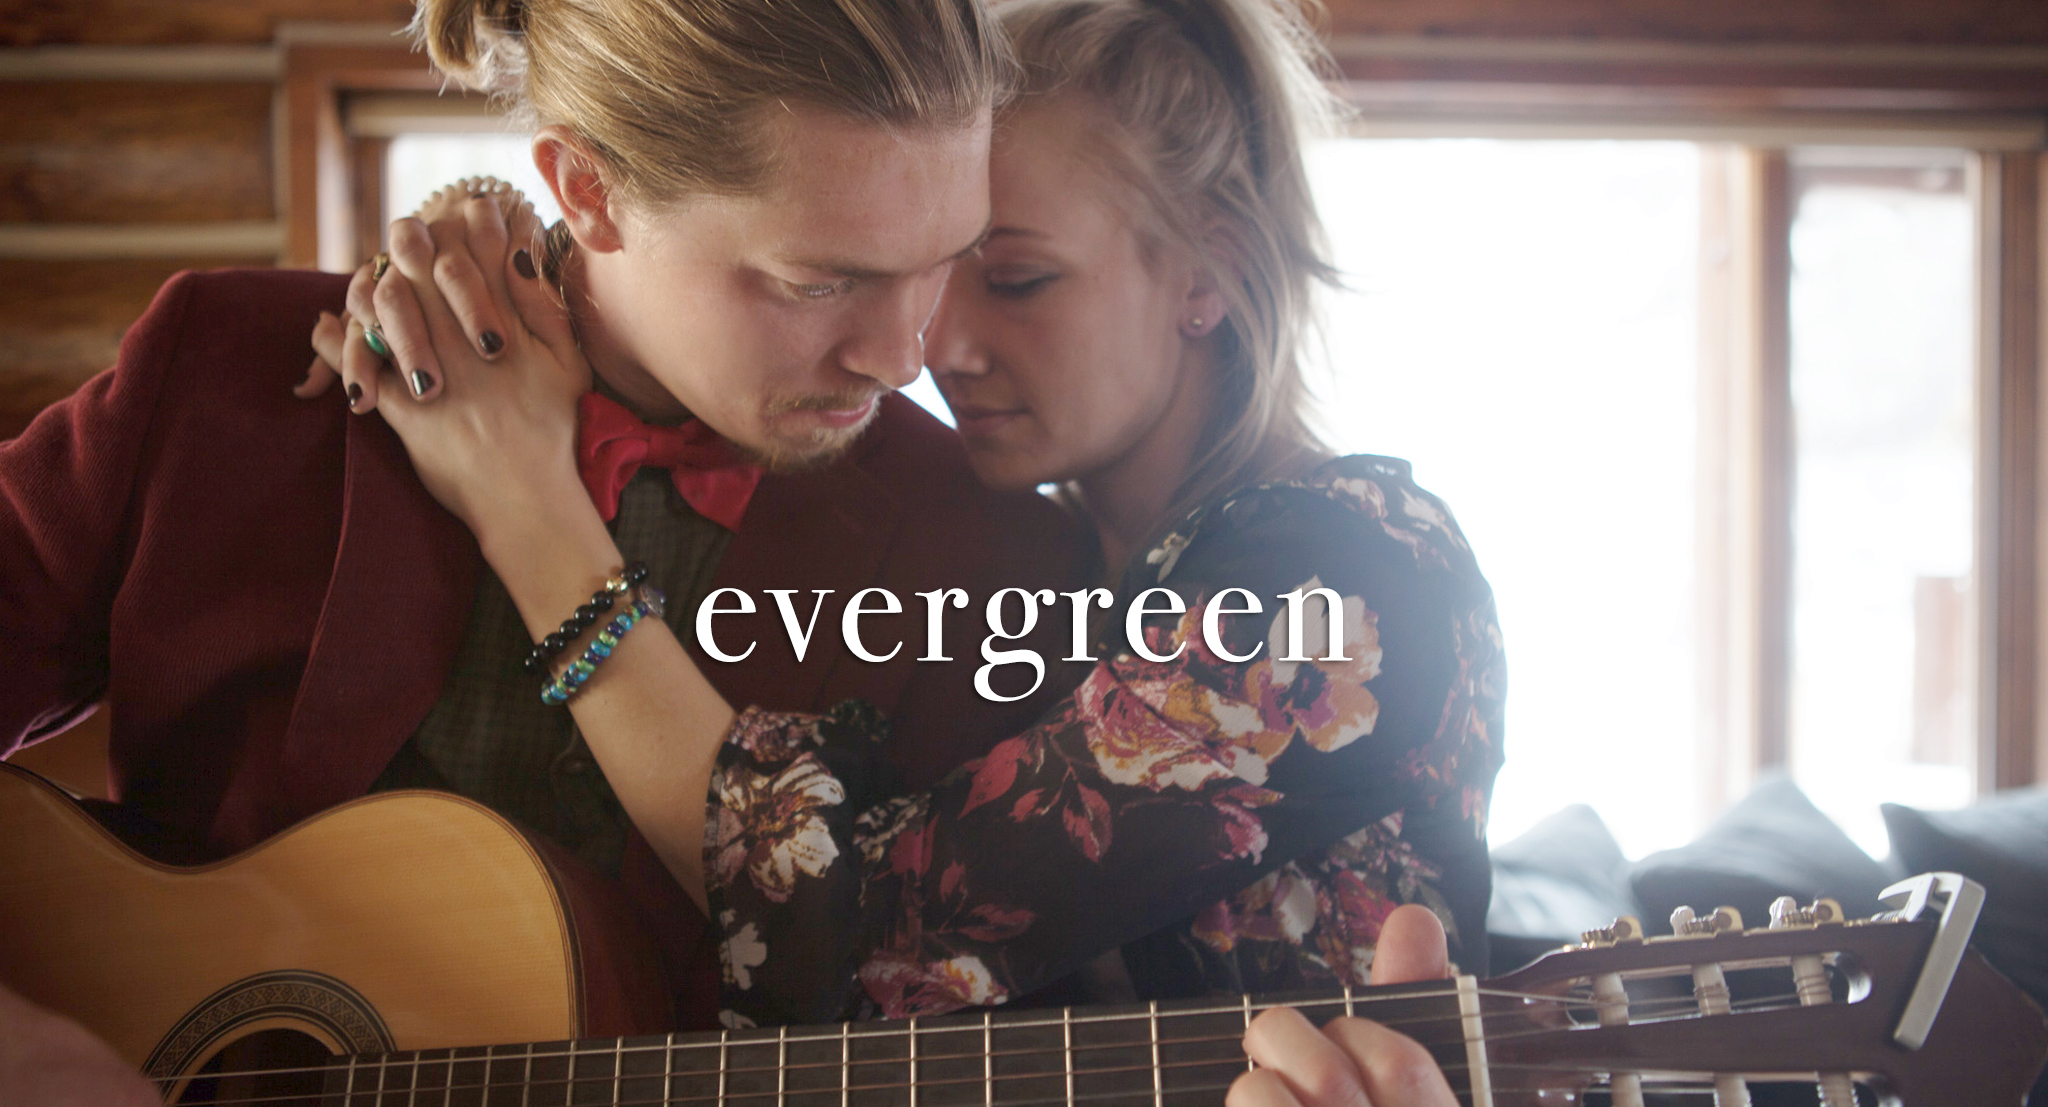 Amanda Maddox and Tanner Kalina in Evergreen (2019)